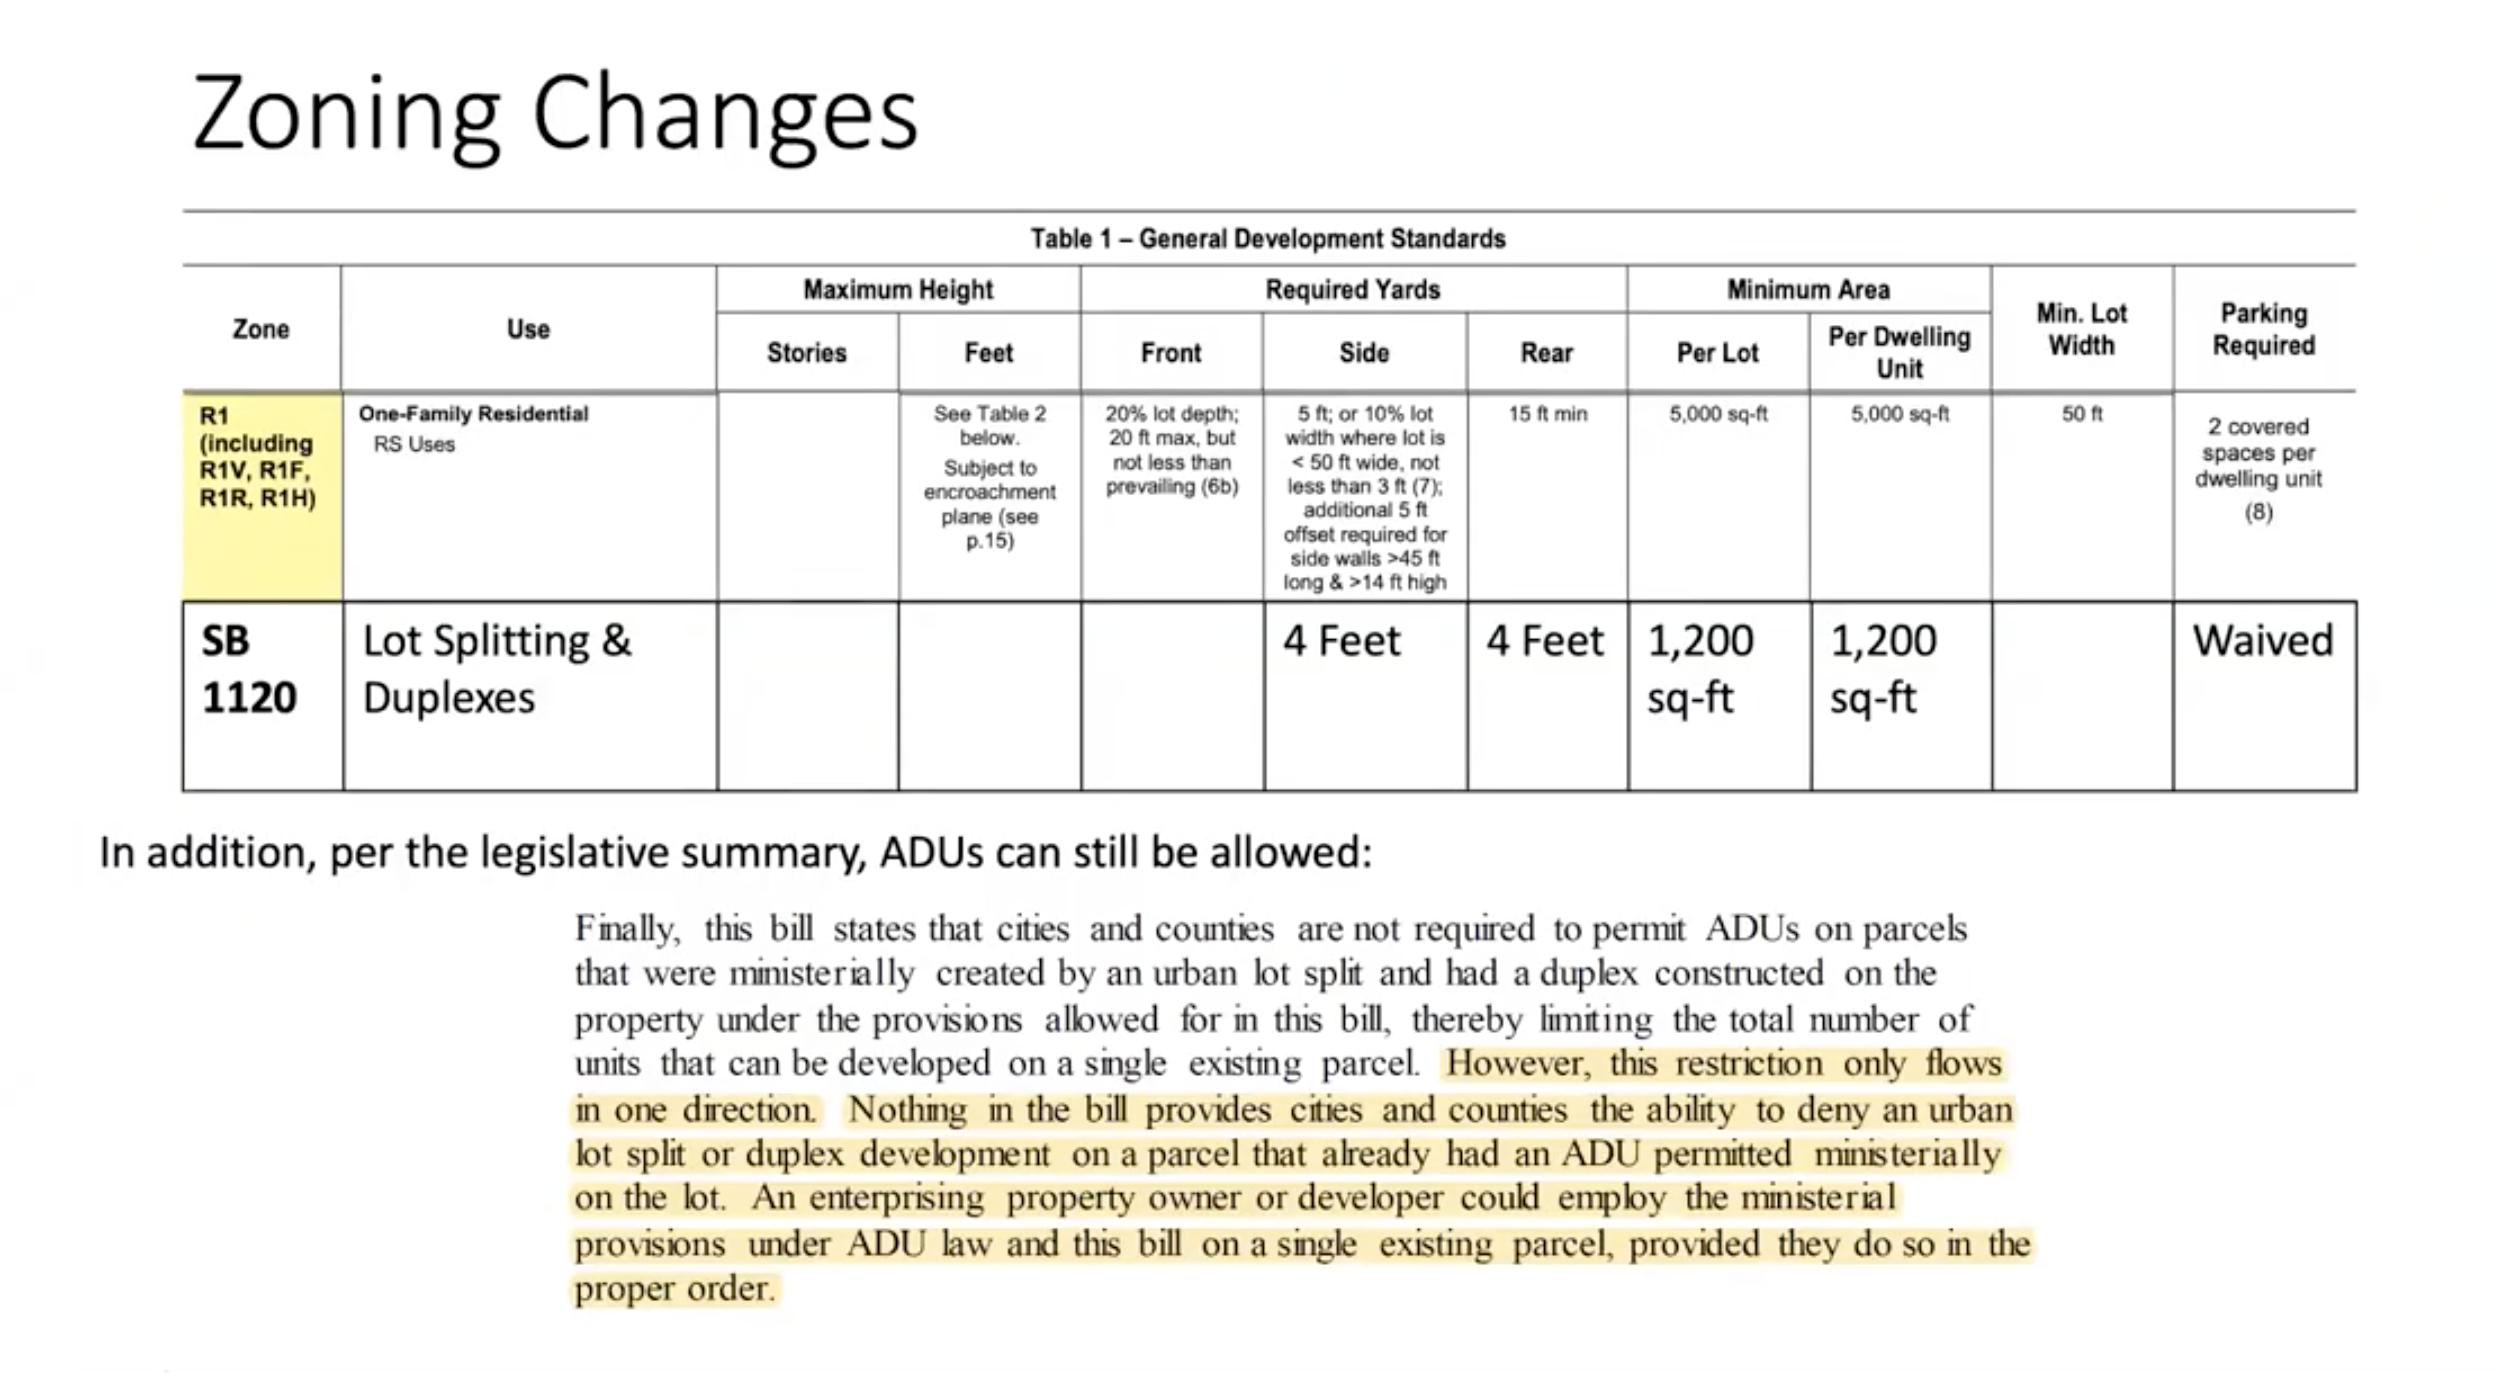 SB 1120 Zoning Changes